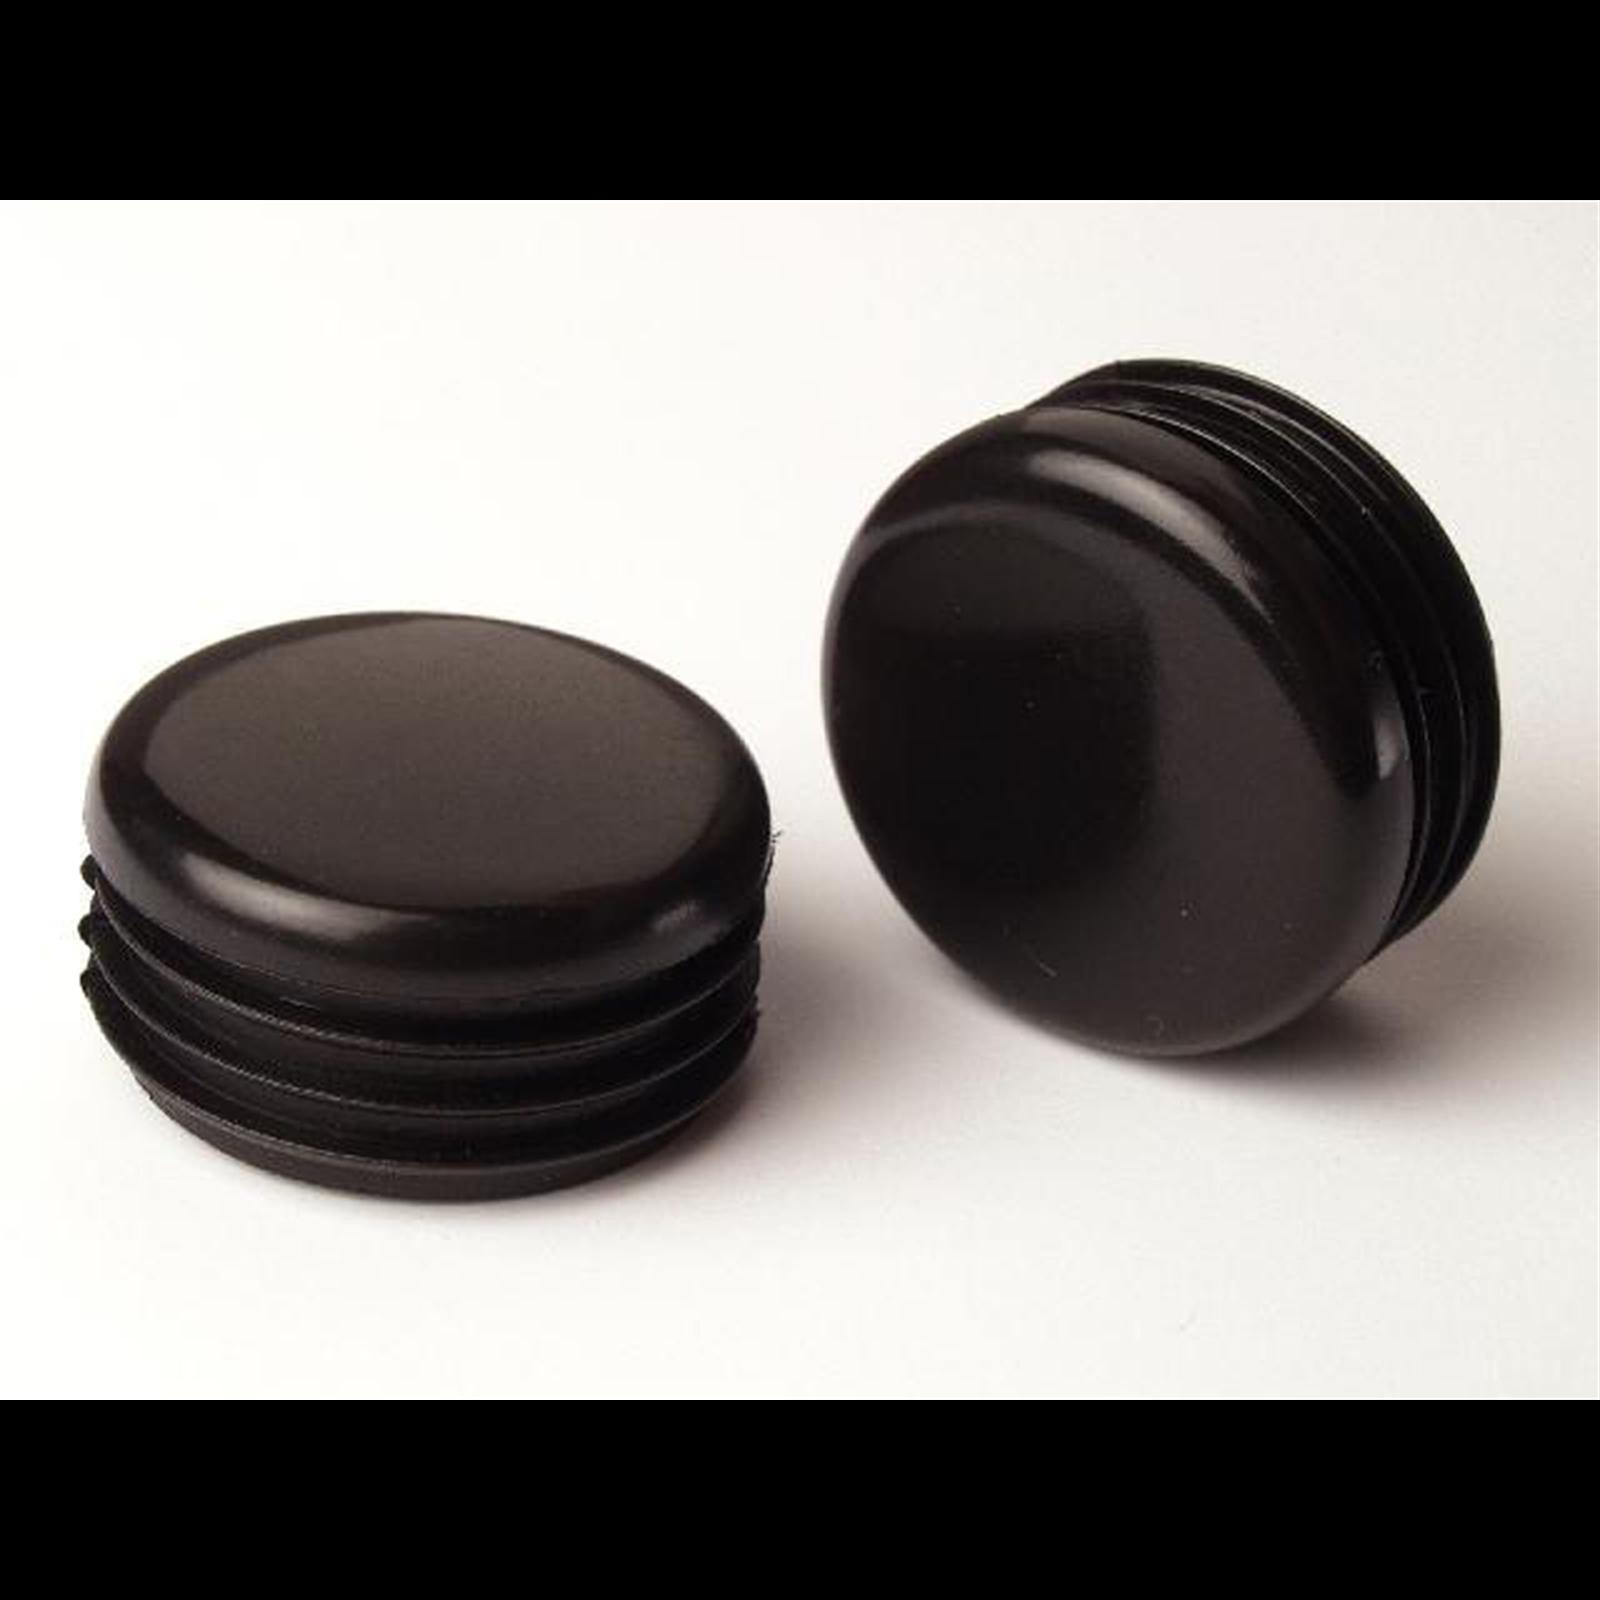 TIC 19mm Black Round Plastic Internal Chair Tip - 4 Piece